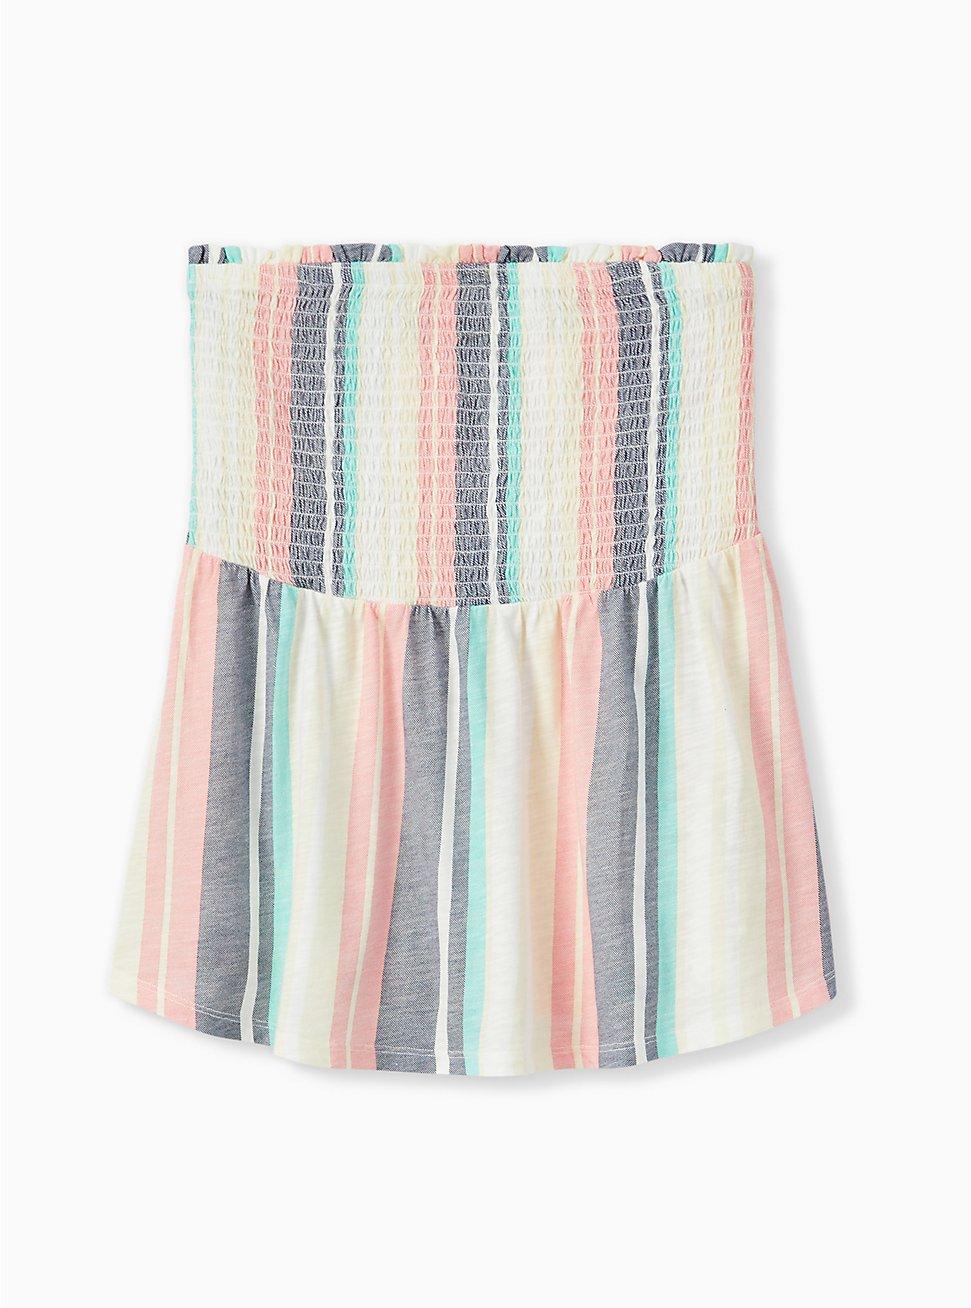 Pastel Stripe Slub Jersey Strapless Babydoll Top , STRIPES, hi-res